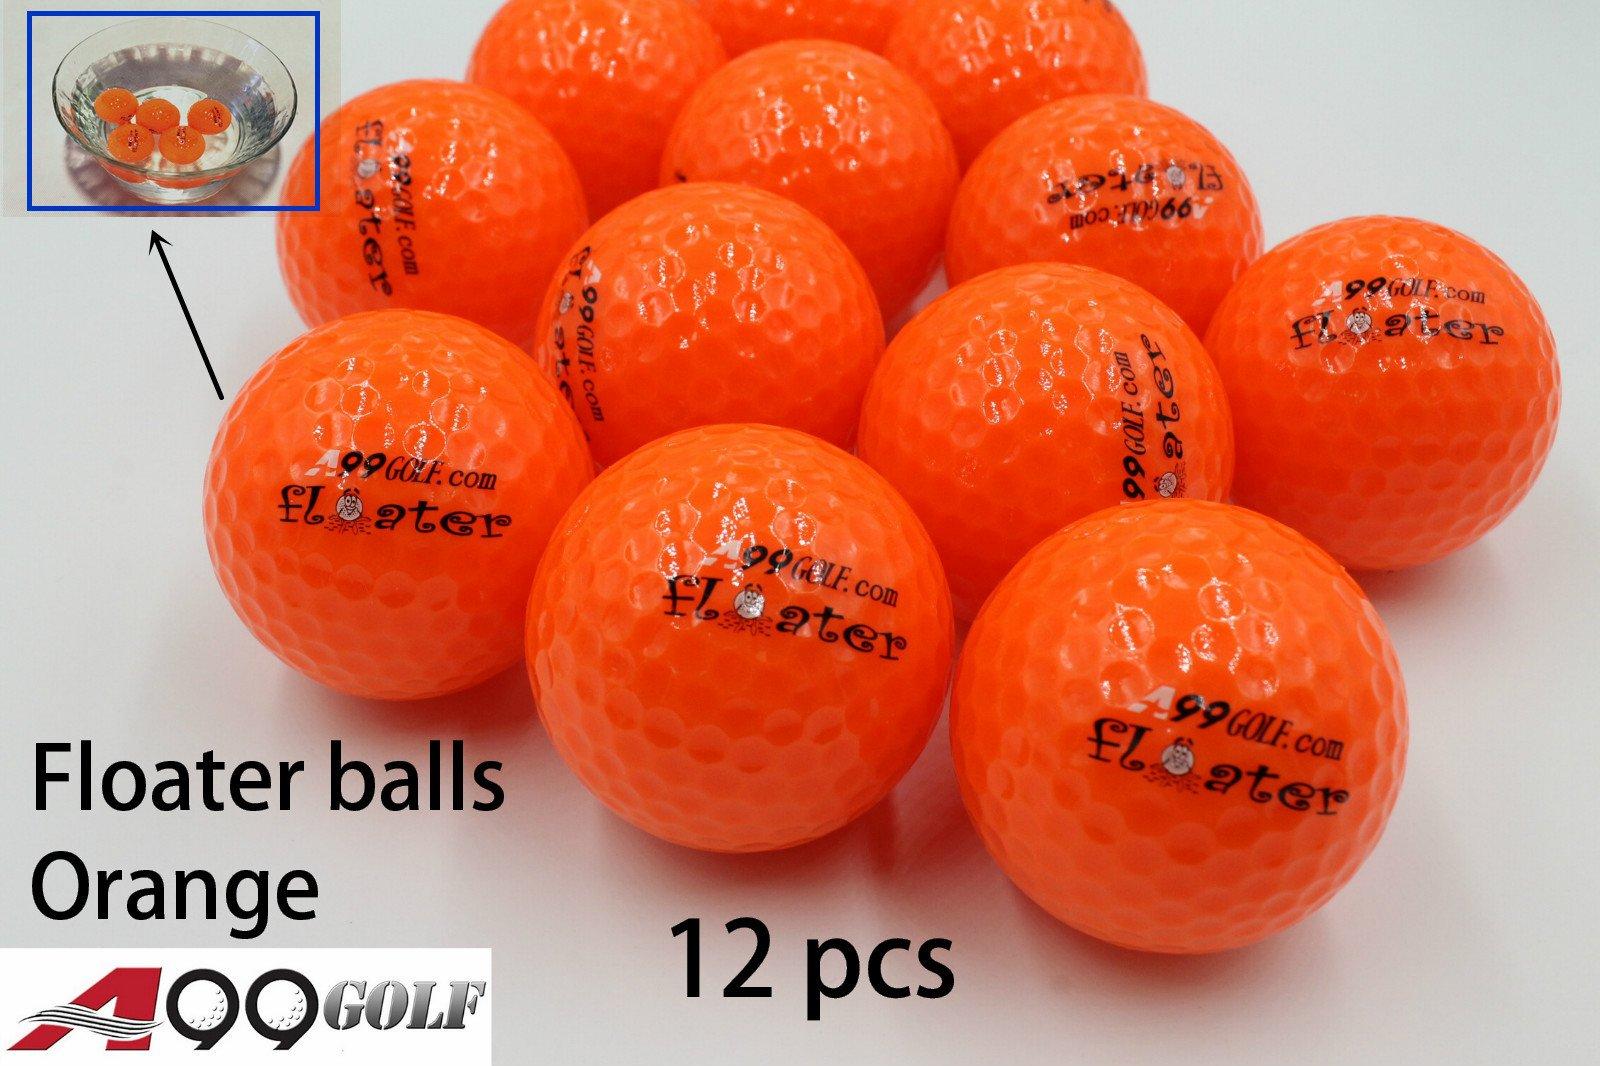 A99 Floating Golf Balls Floater Ball Float Water Range 12pcs, Orange by A99 Golf